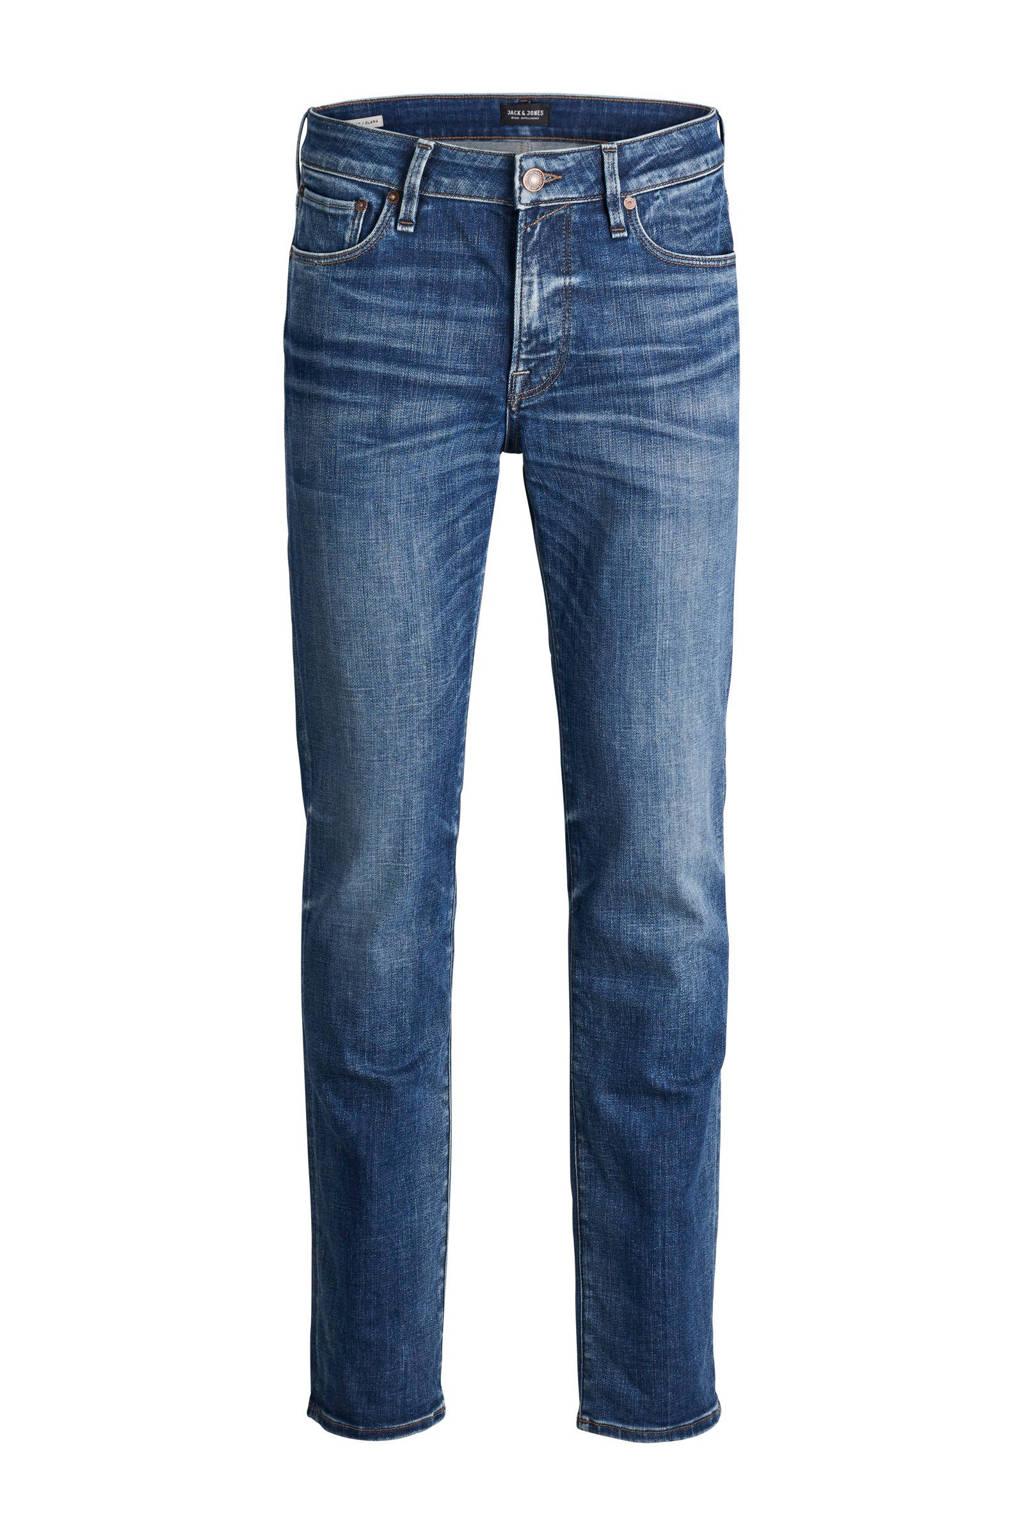 Jack & Jones Intelligence regular fit jeans, Dark denim